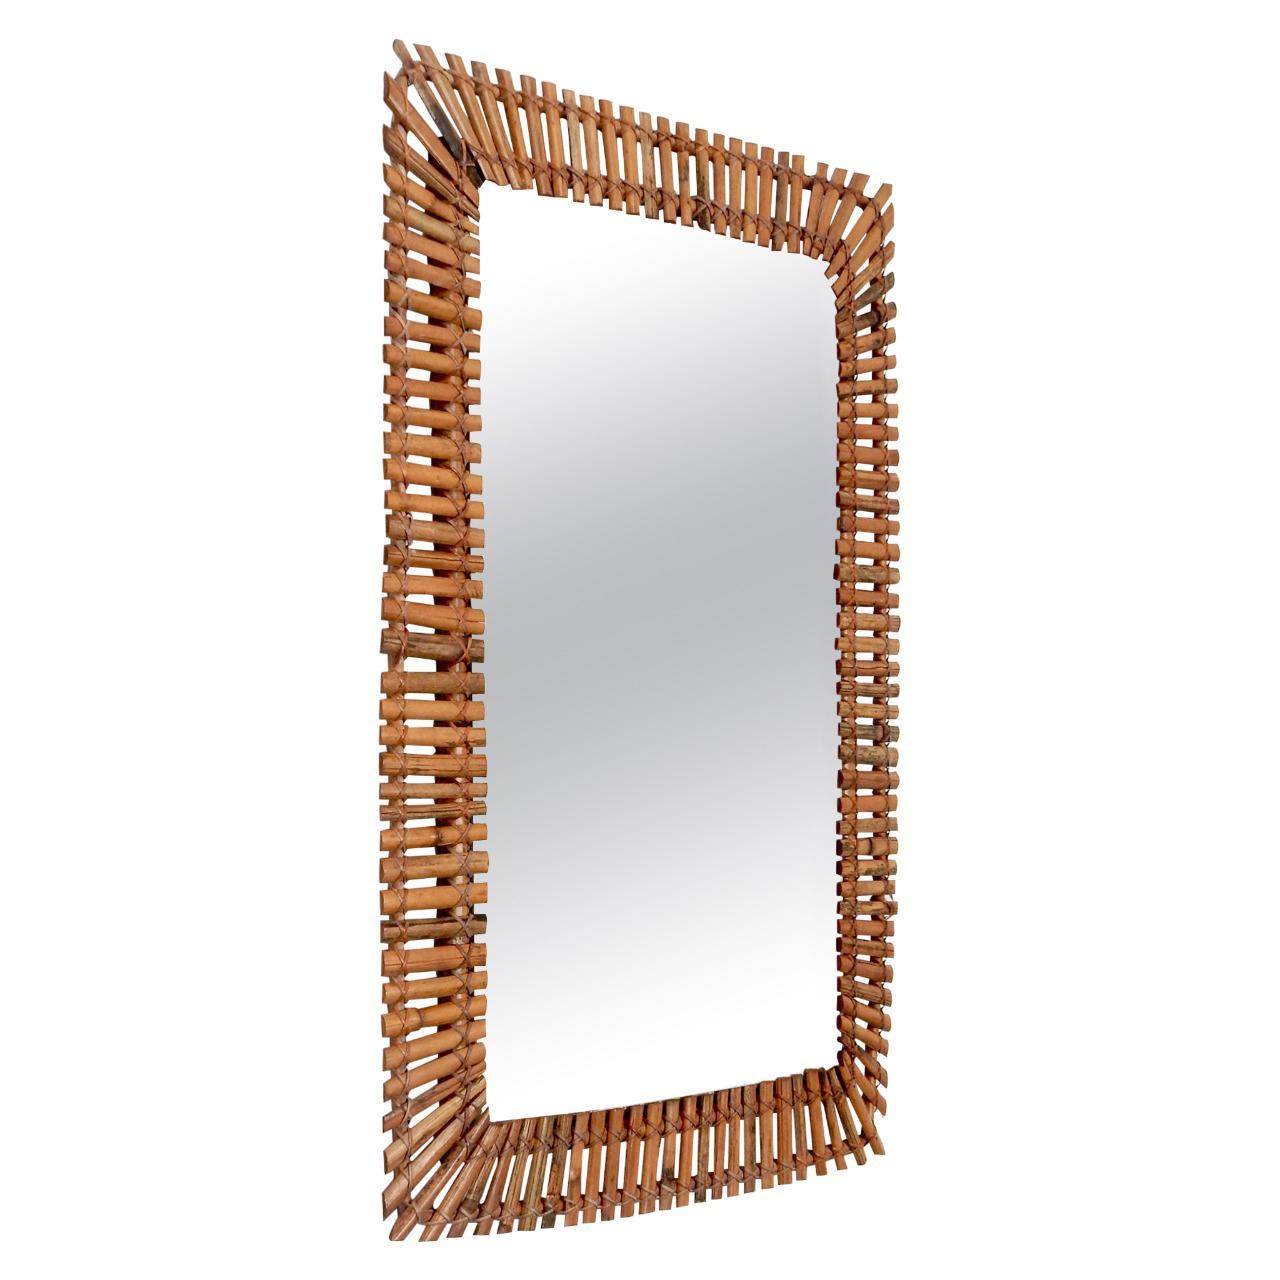 Rectangular Bamboo/Rattan Frame Mirror, Italy, 1950s